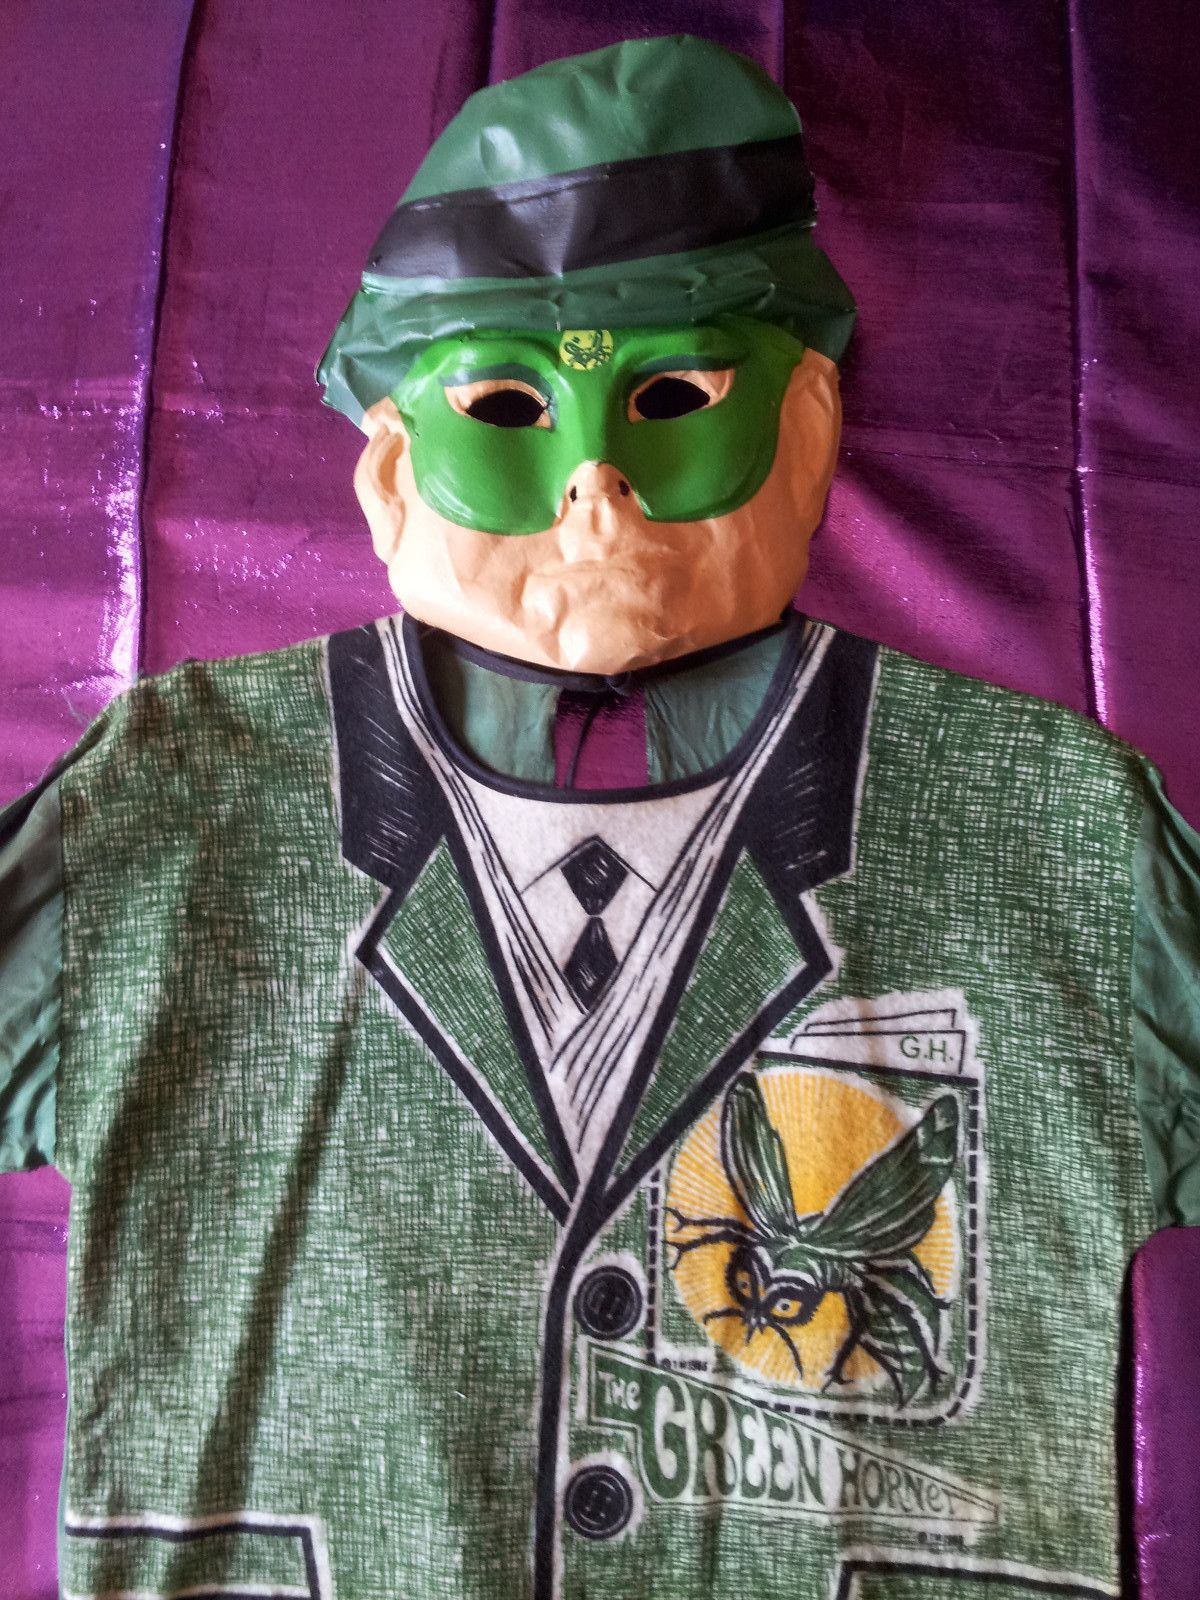 greenhornet_costume2